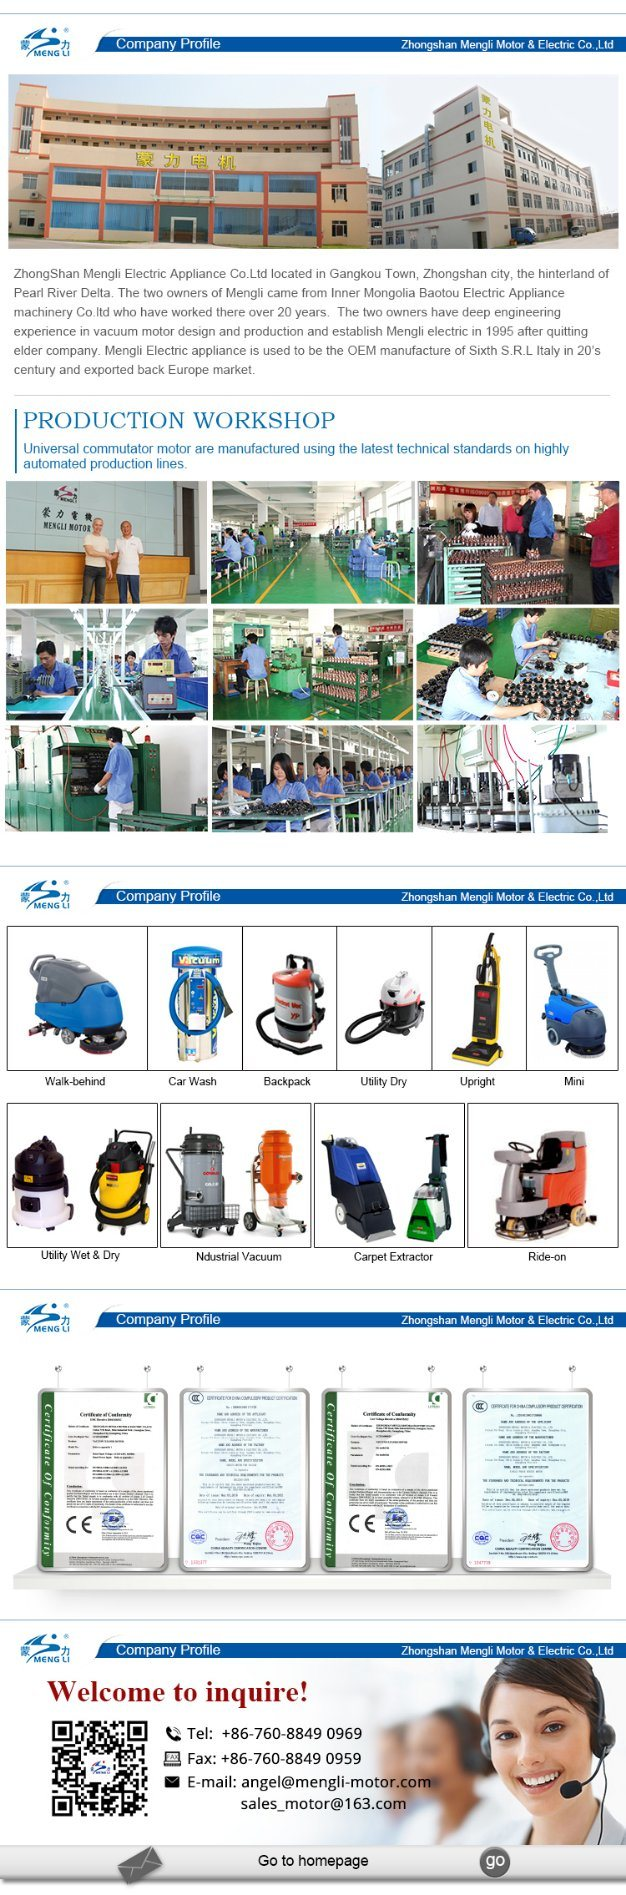 China Supplier Hight Qualtiy AC Vacuum Cleaner Motor / Wet and Dry Vacuum Cleaner Motor